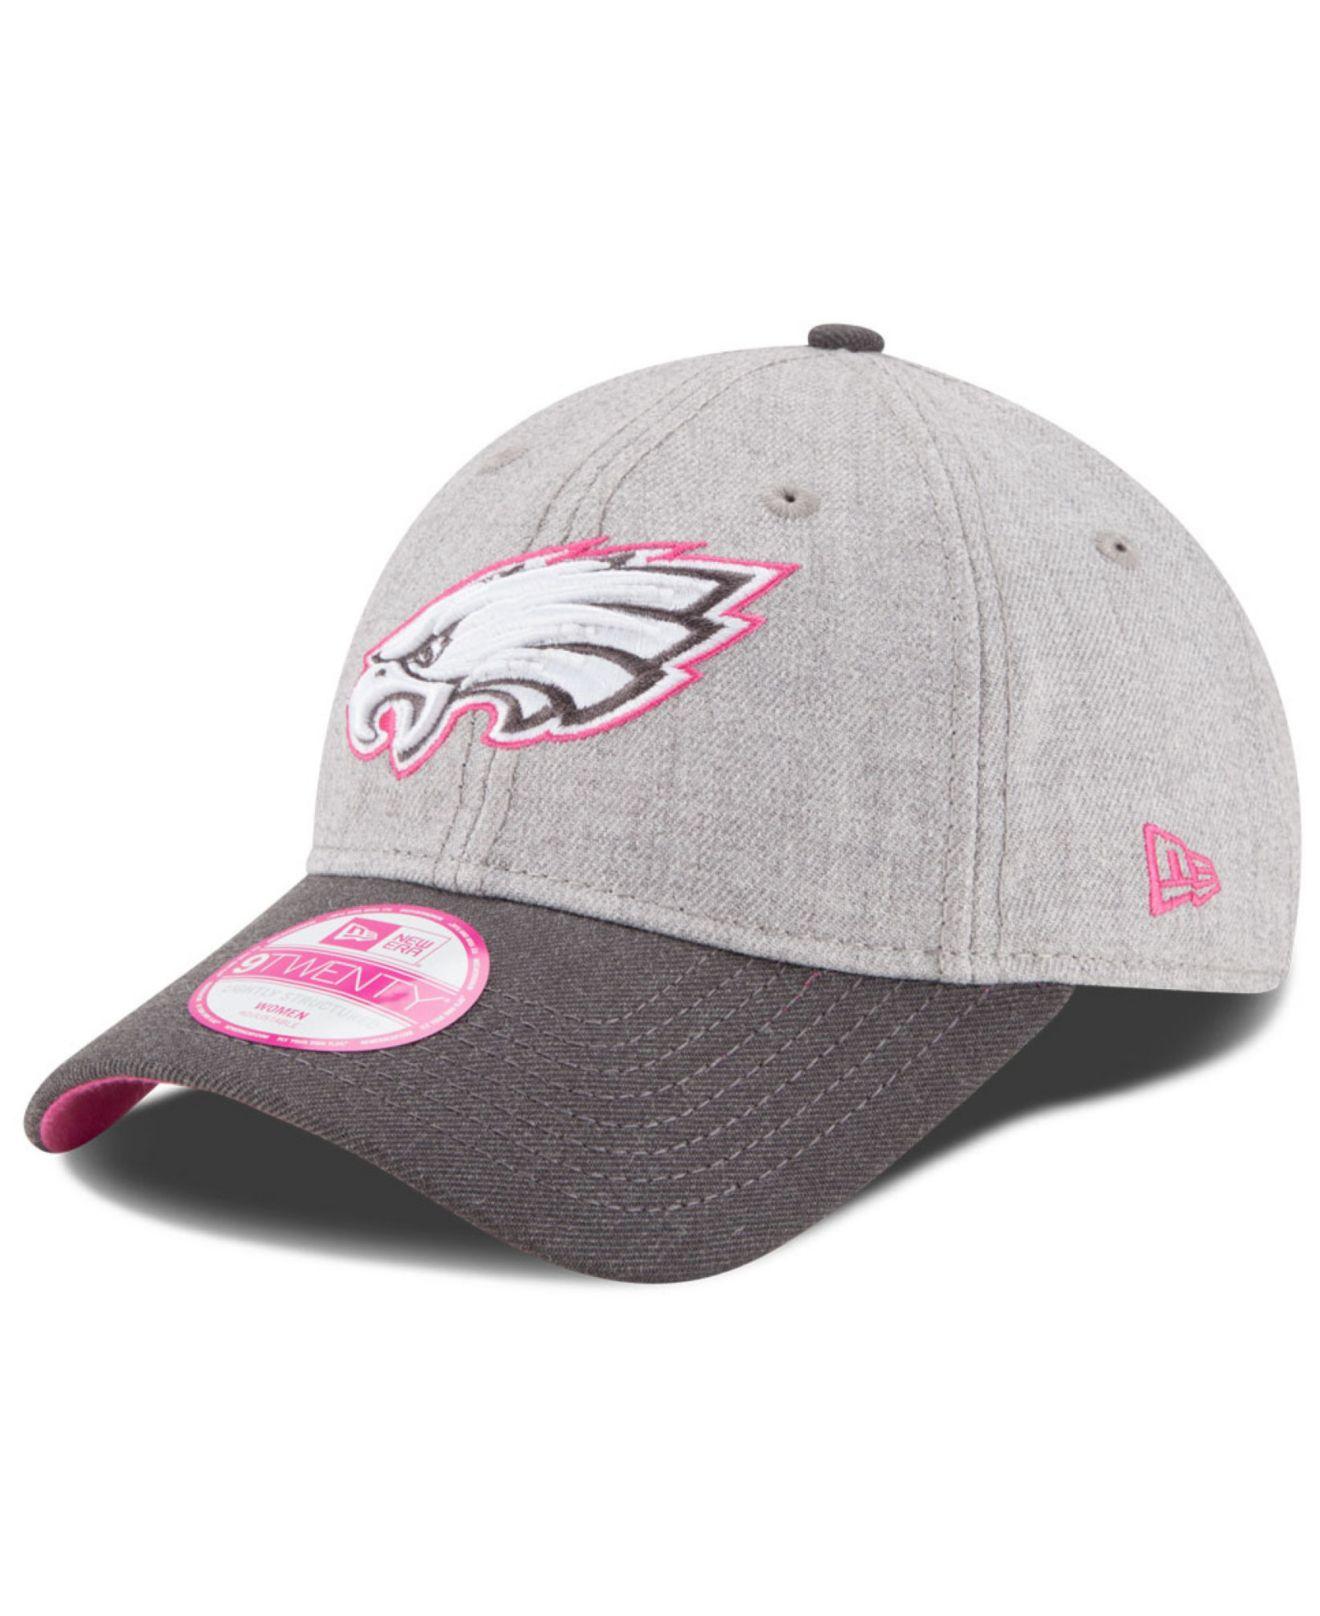 purchase cheap b07ae fae18 ... promo code lyst ktz womens philadelphia eagles breast cancer awareness 9twenty  cap in gray e4e0a 0d9e2